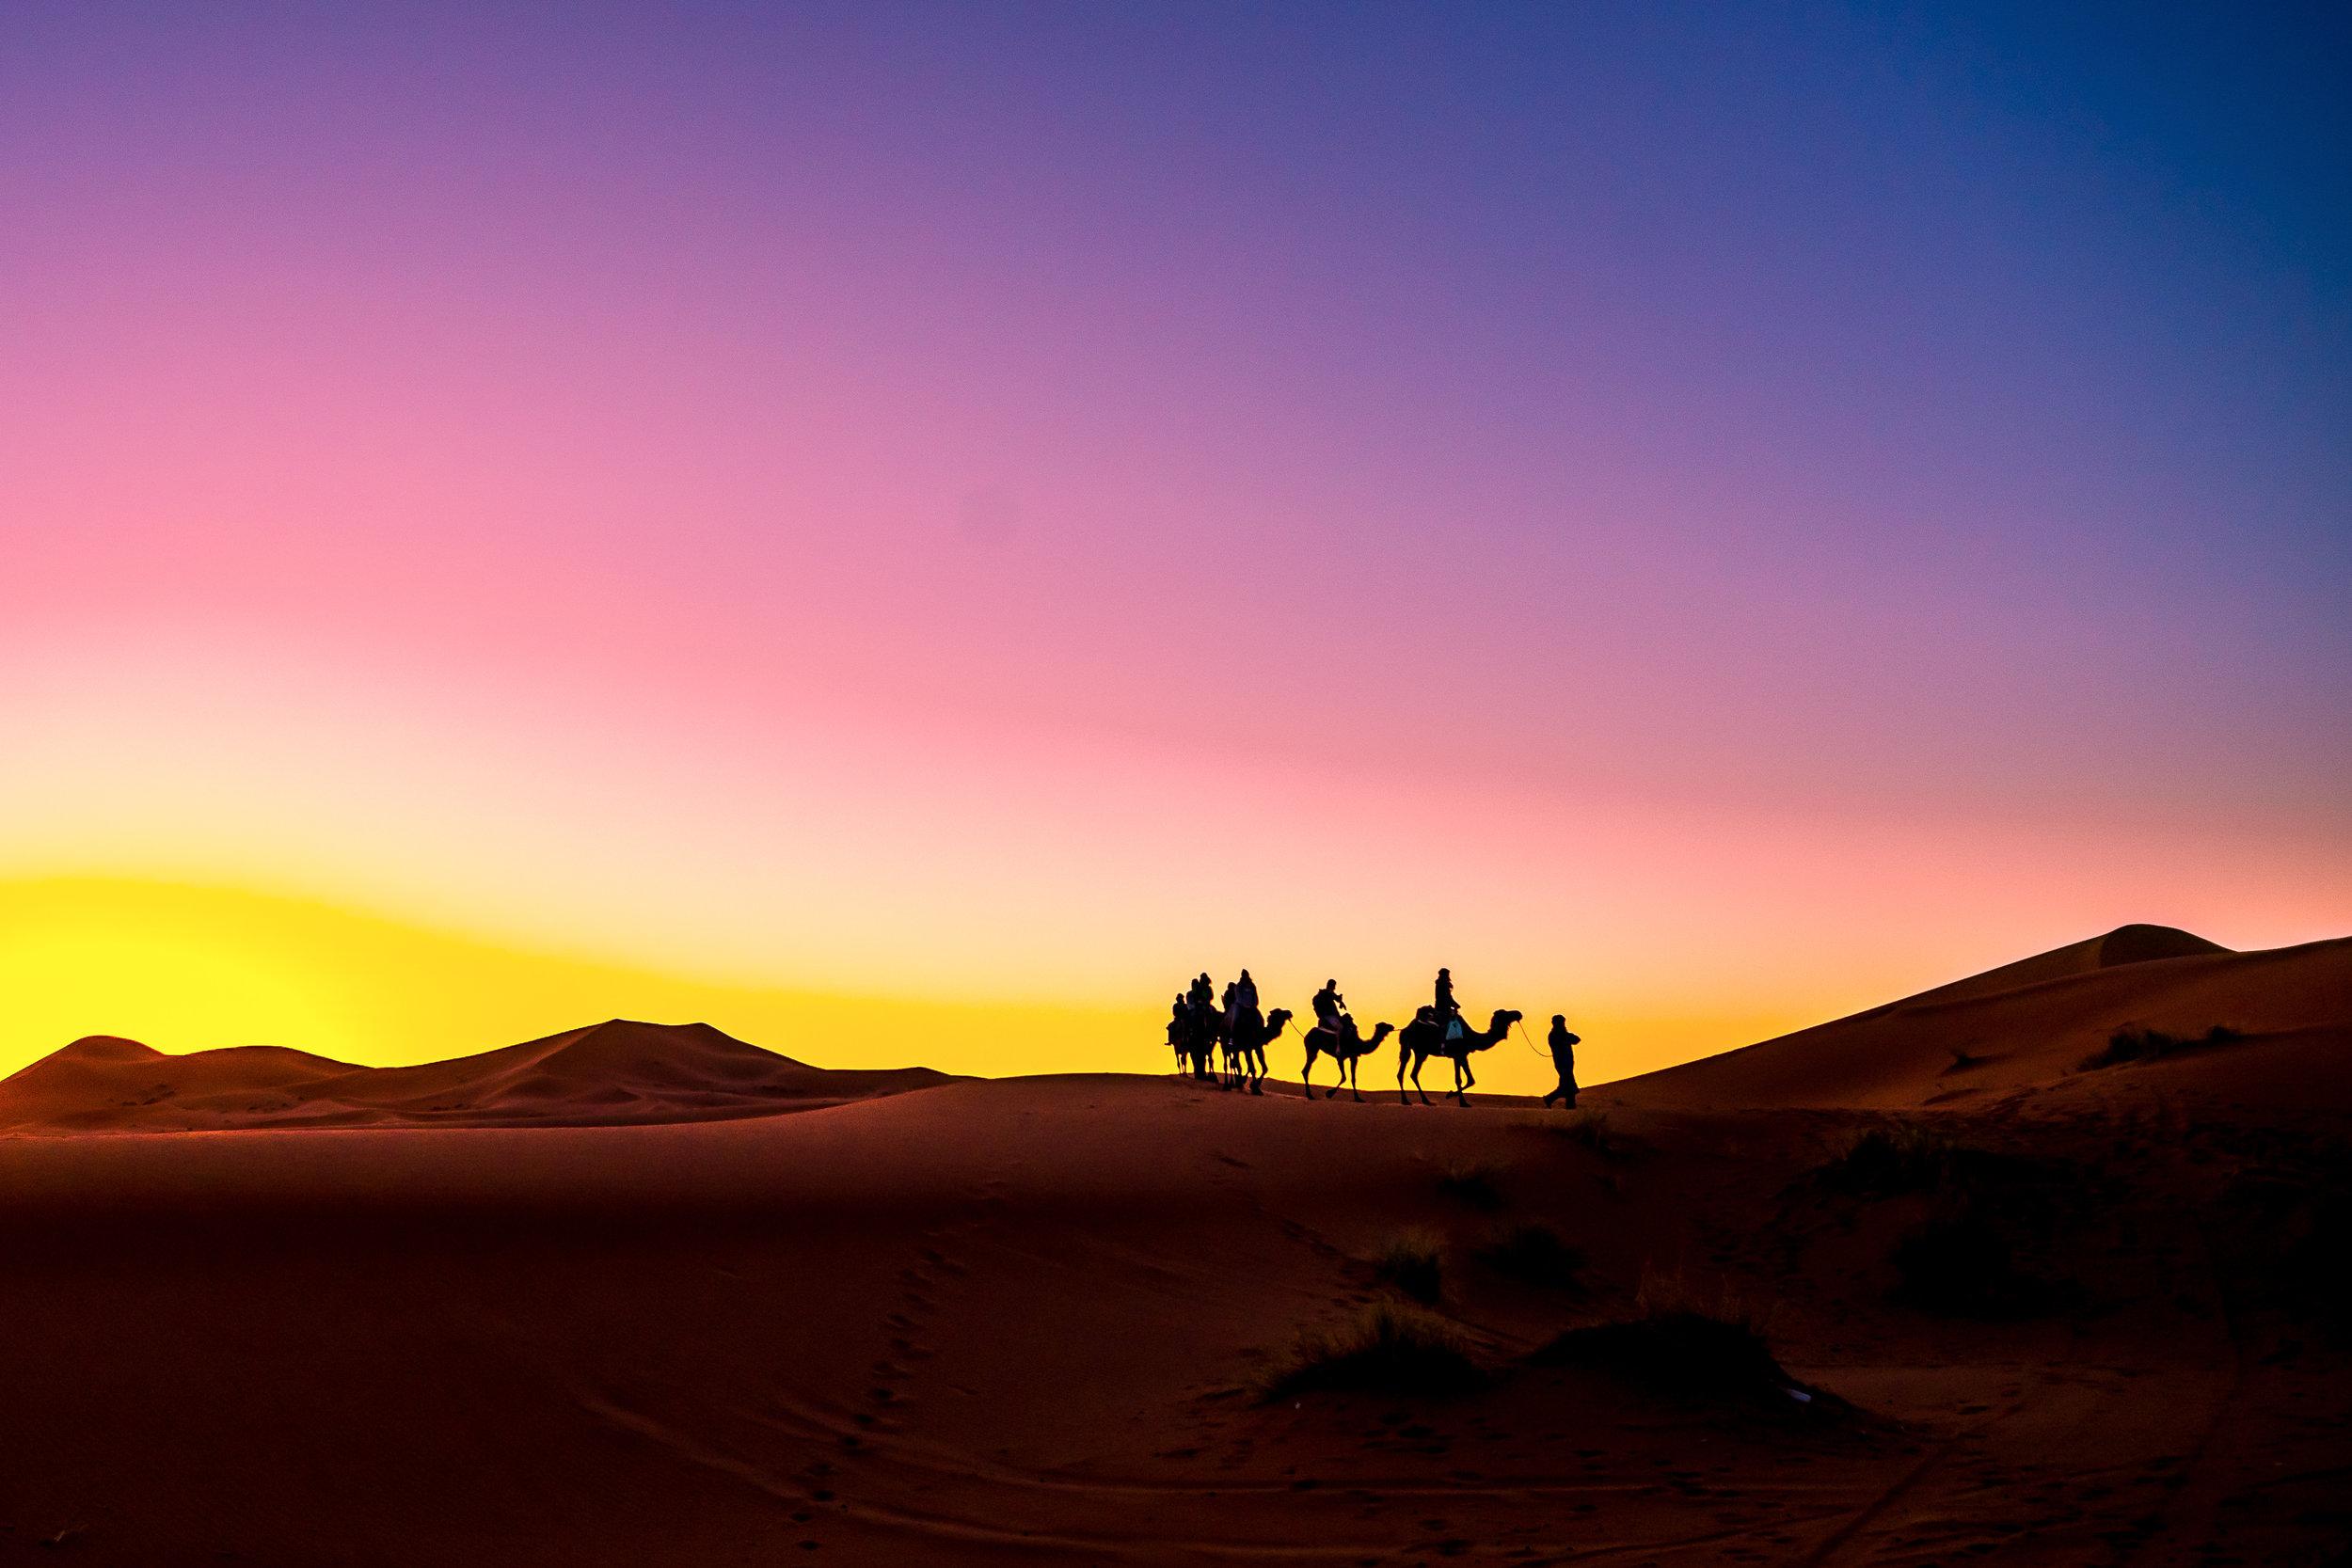 Sunrise in the Sahara - Morocco